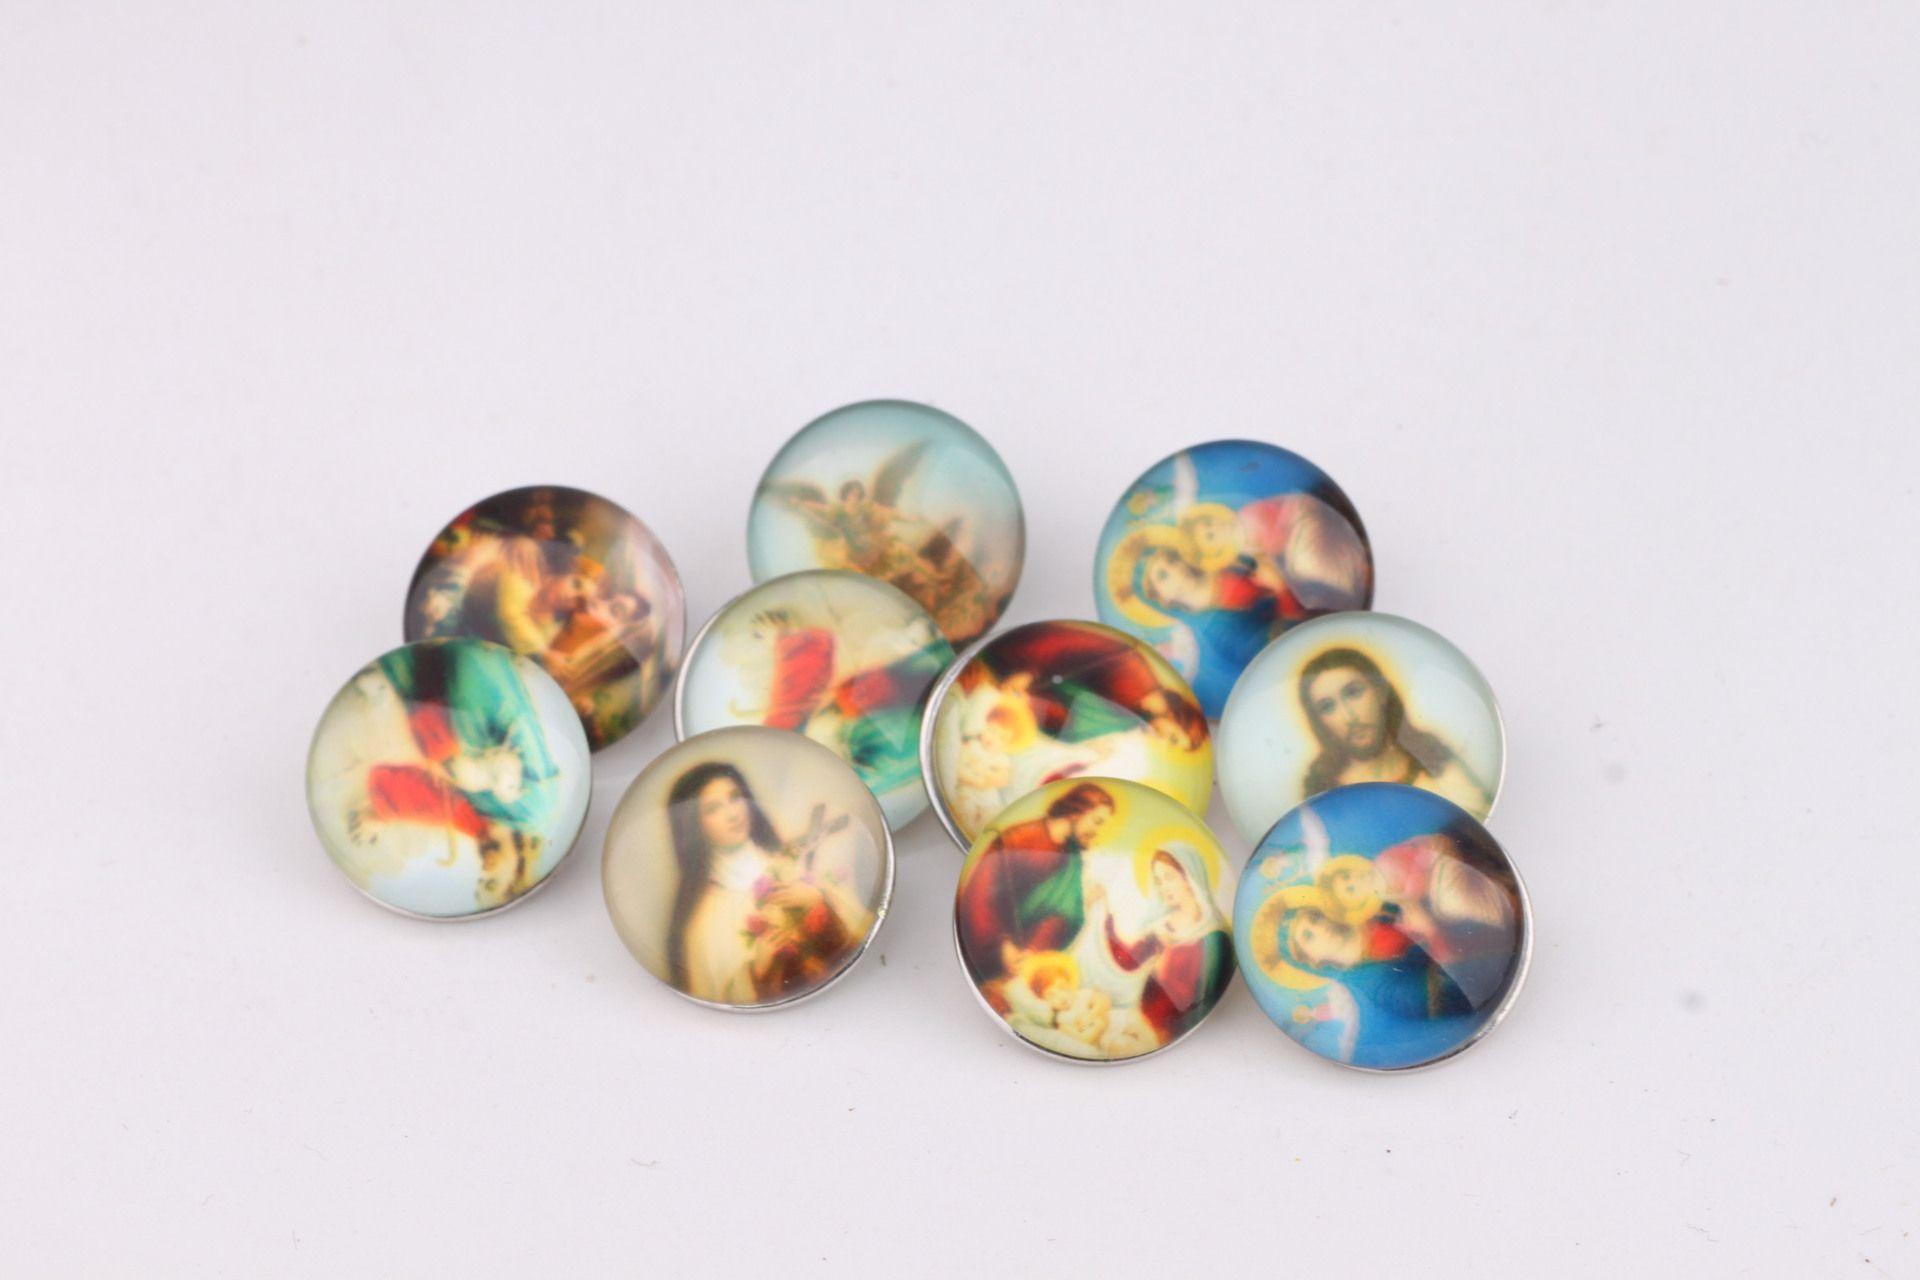 JACK88 Hot Sale Mix Styles DIY 18mm About Jesus Ginger Glass Snap Buttons Fit Snap Button Bracelet M614